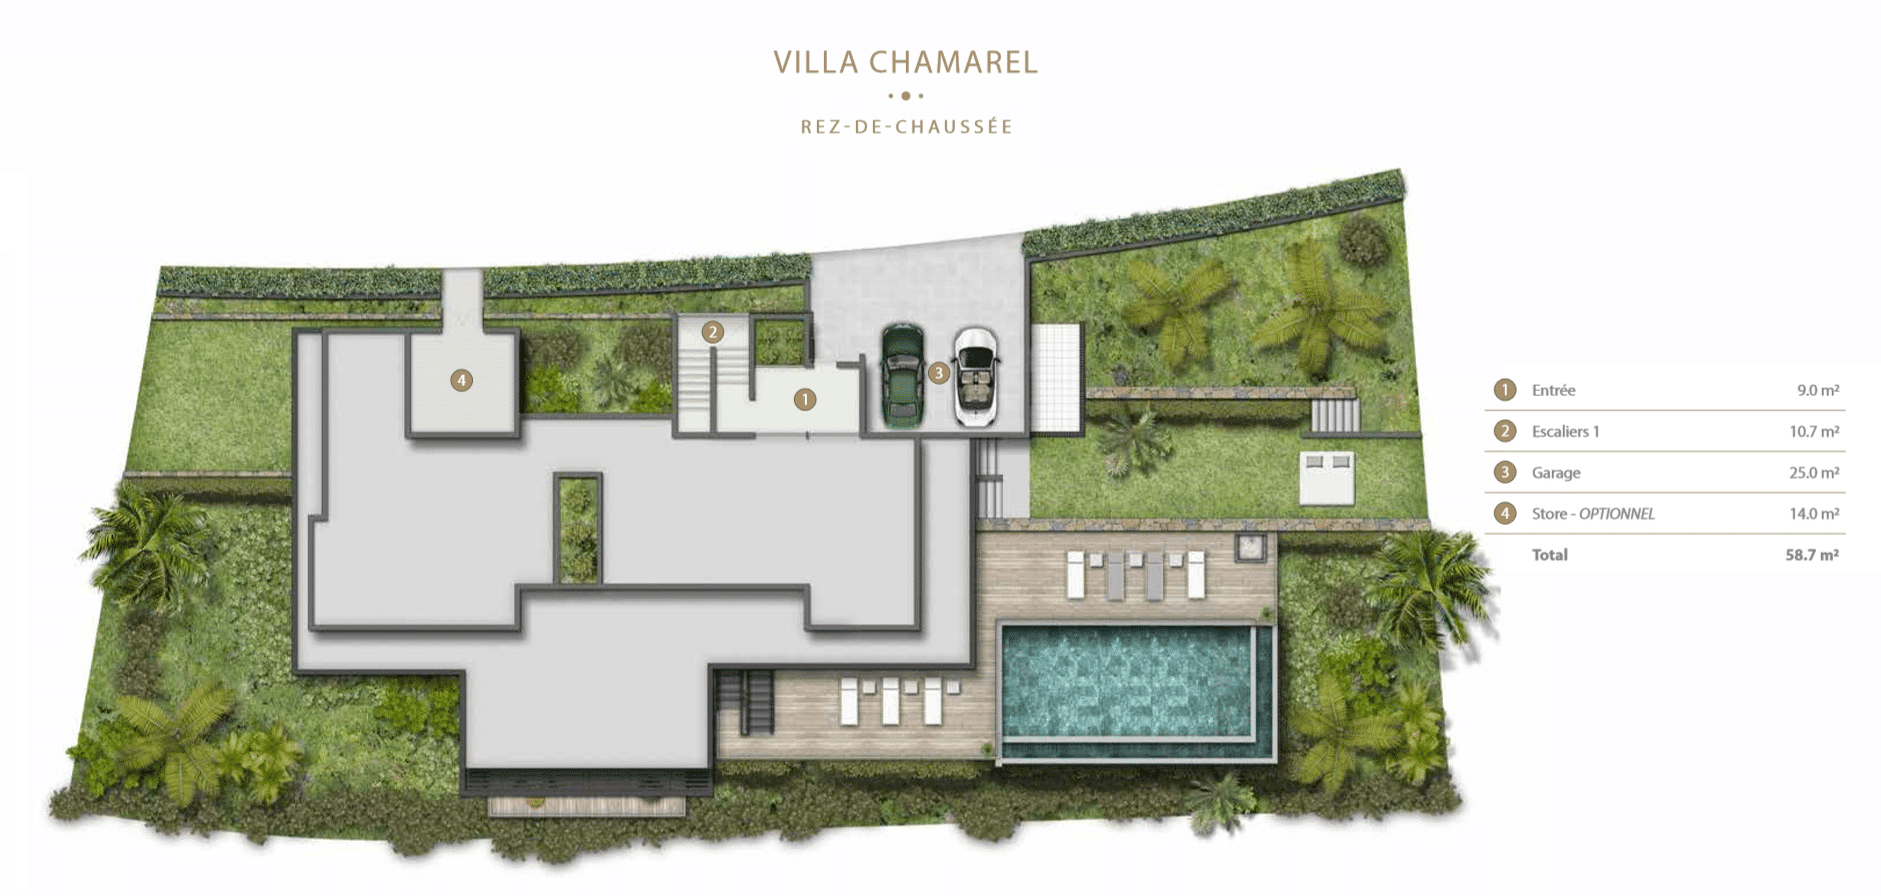 Villa Chamarel Legend Hill Ile Maurice